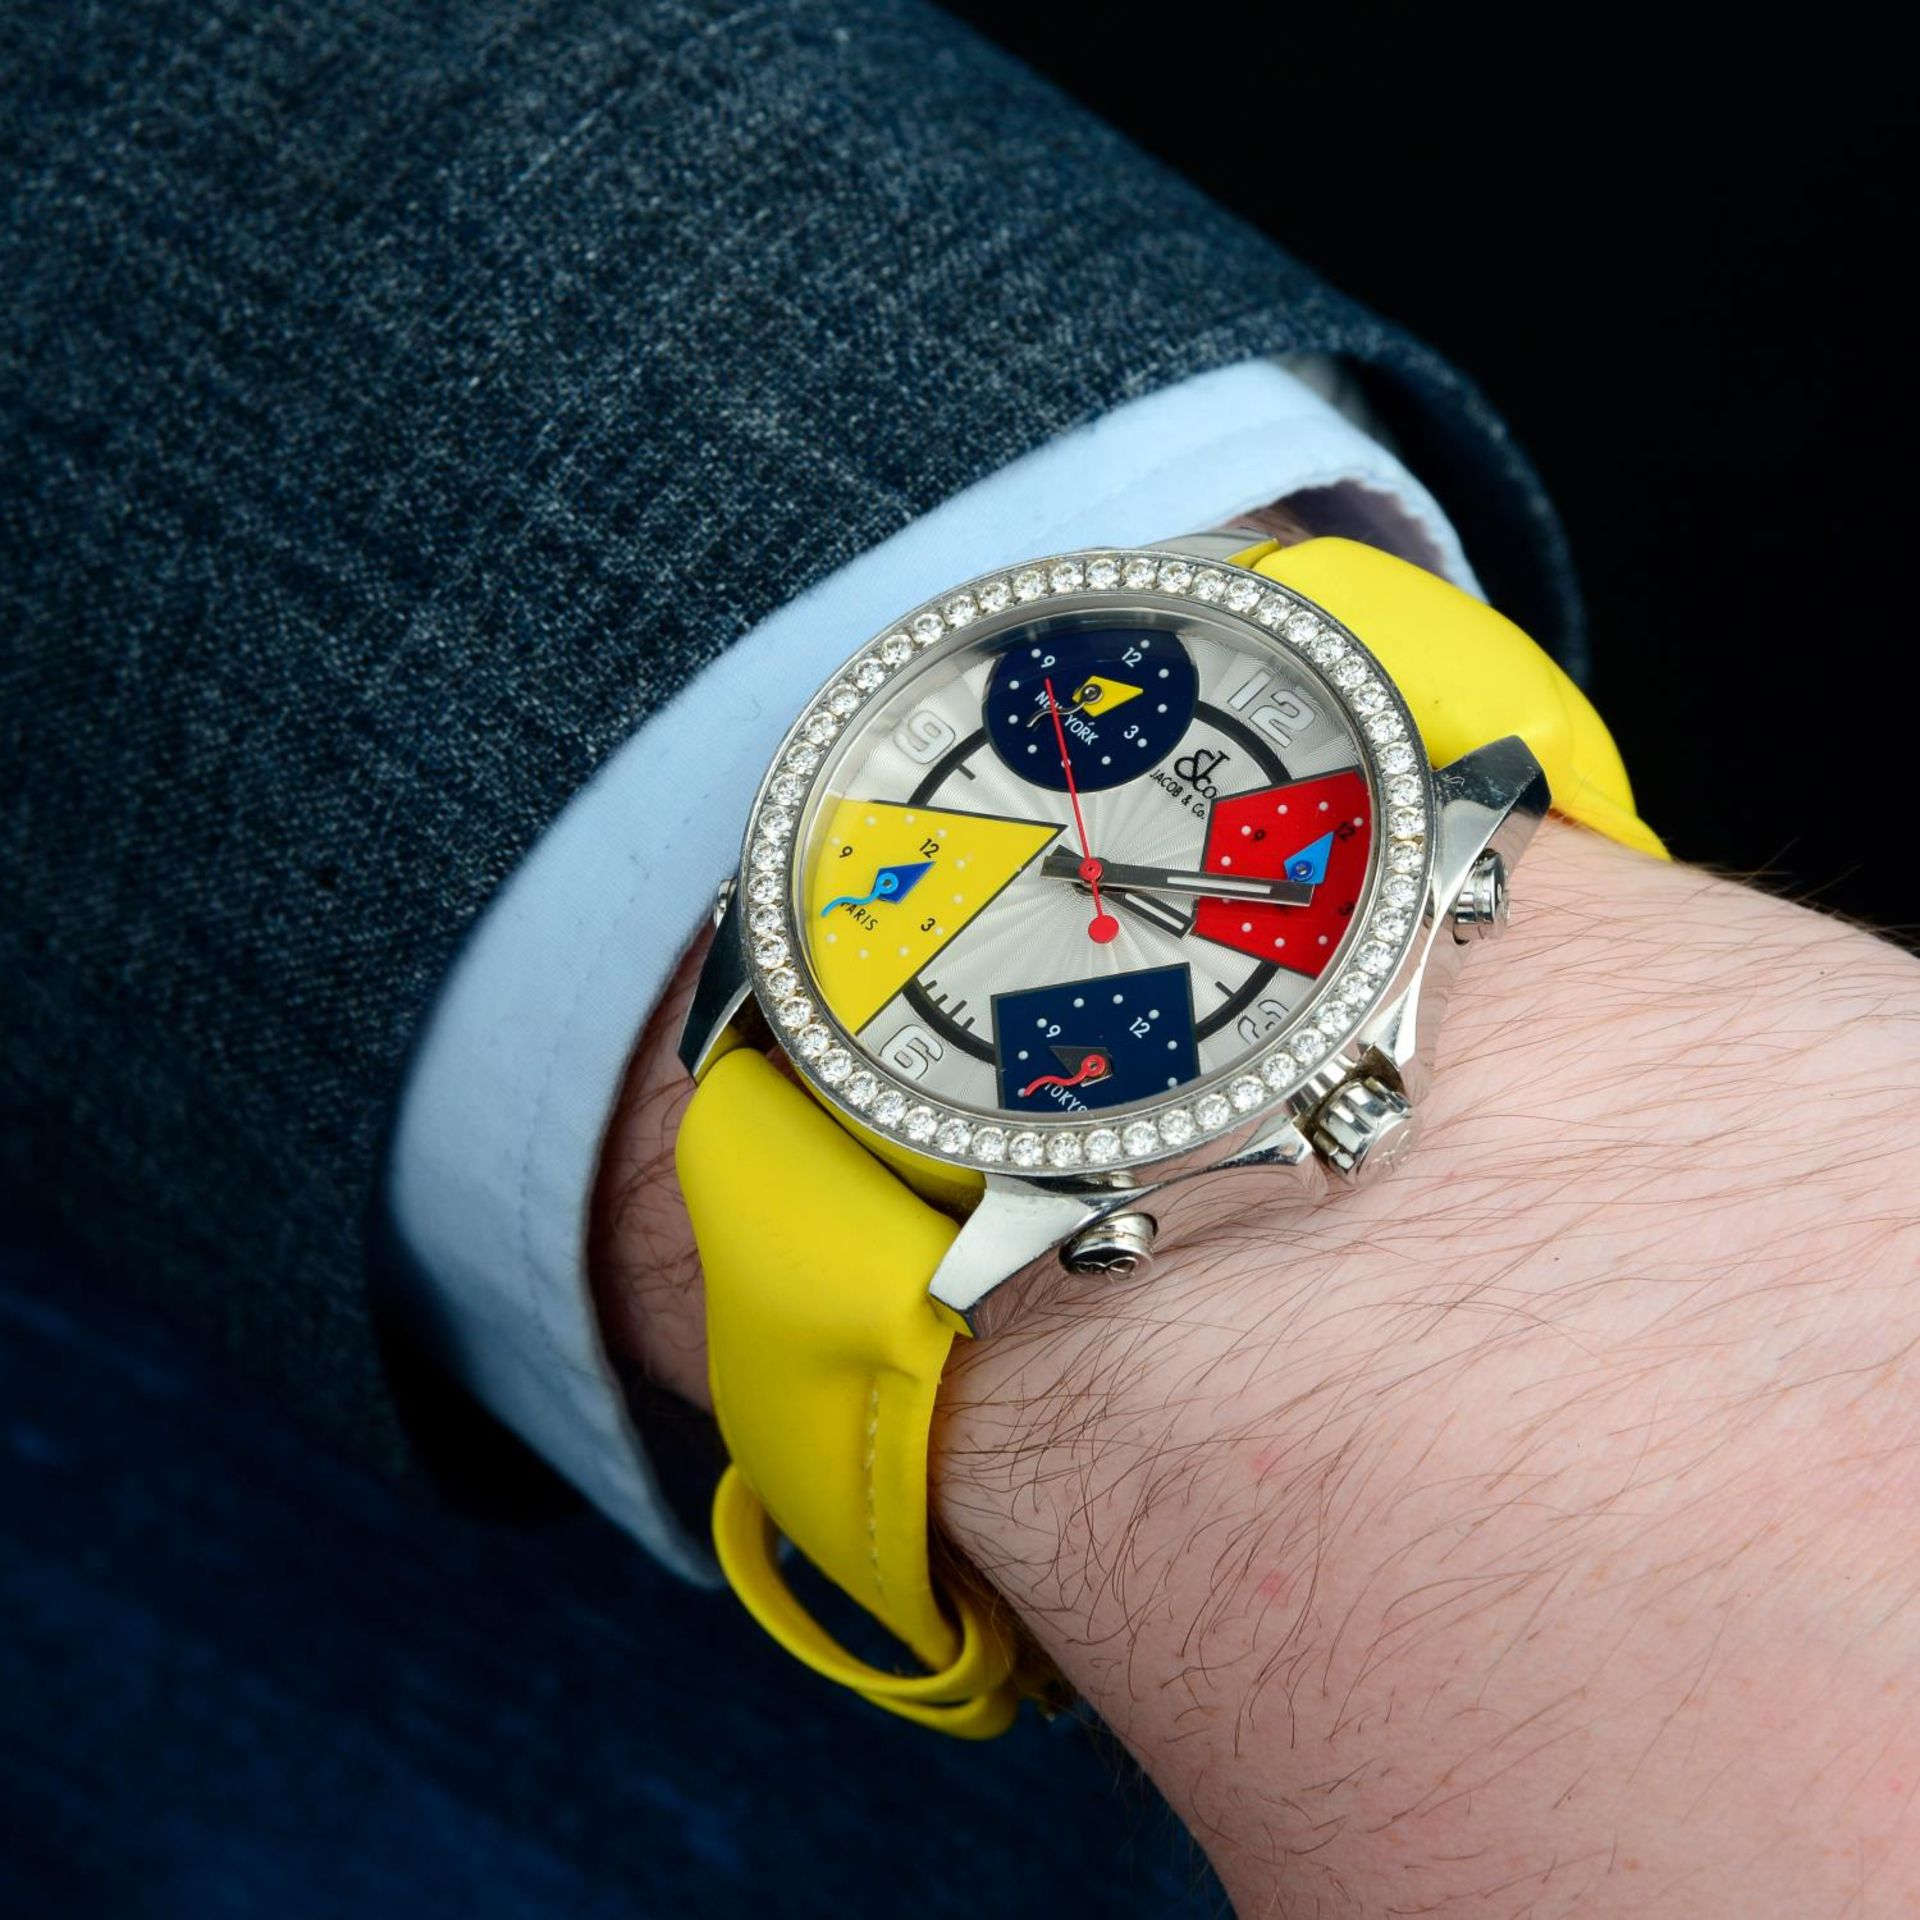 JACOB & CO. - a Five Time Zone wrist watch. - Bild 4 aus 8